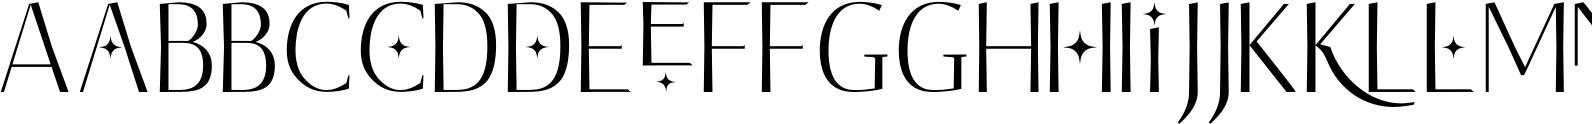 Classy Almires Font Duo